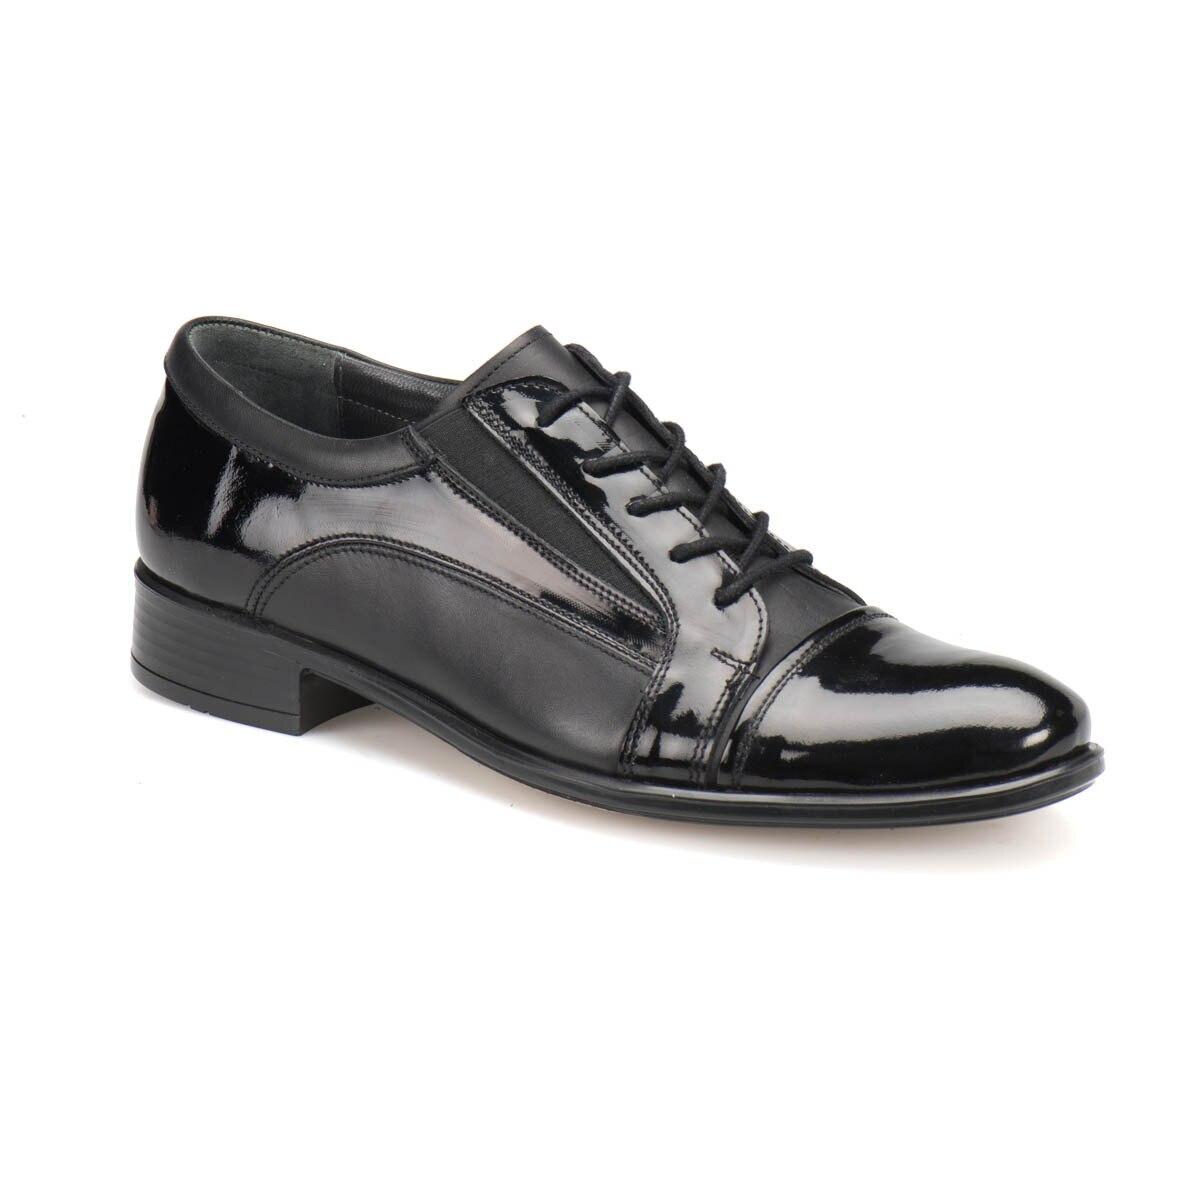 FLO 301 Black Men 'S Classic Shoes Garamond